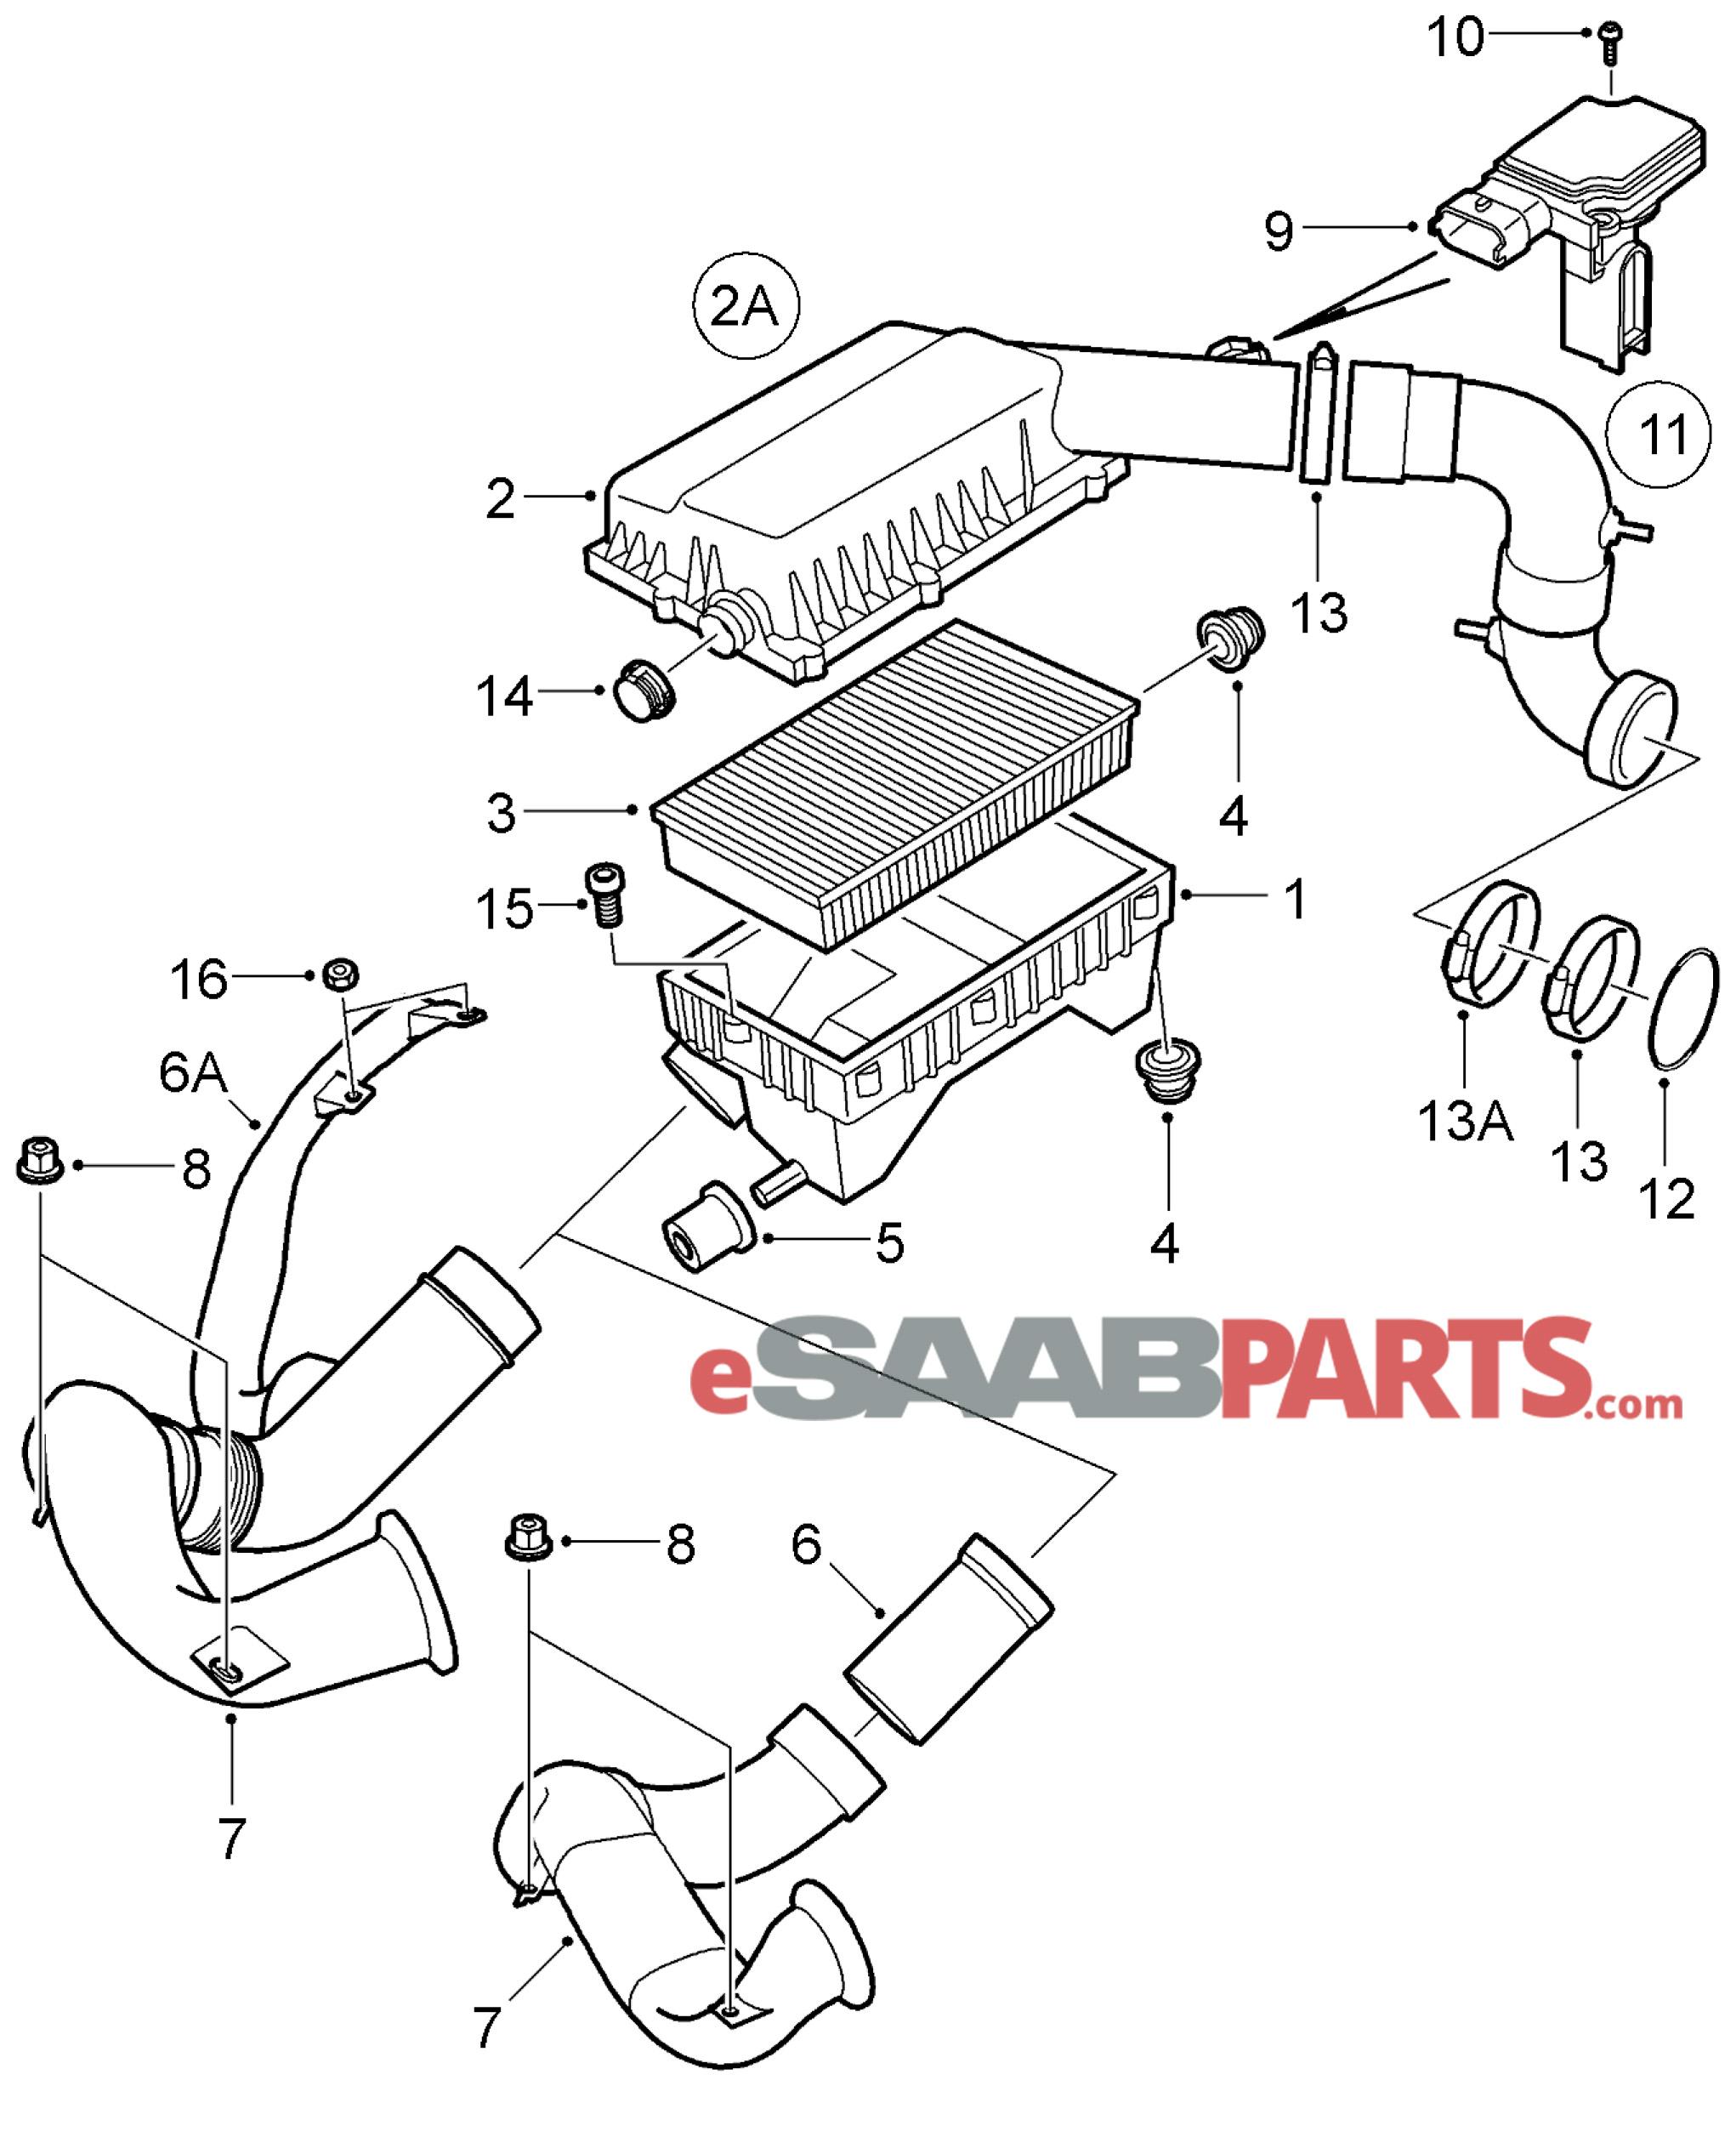 12788131 saab mass air flow sensor genuine saab parts from rh esaabparts saab 93 parts diagram saab parts breakdown